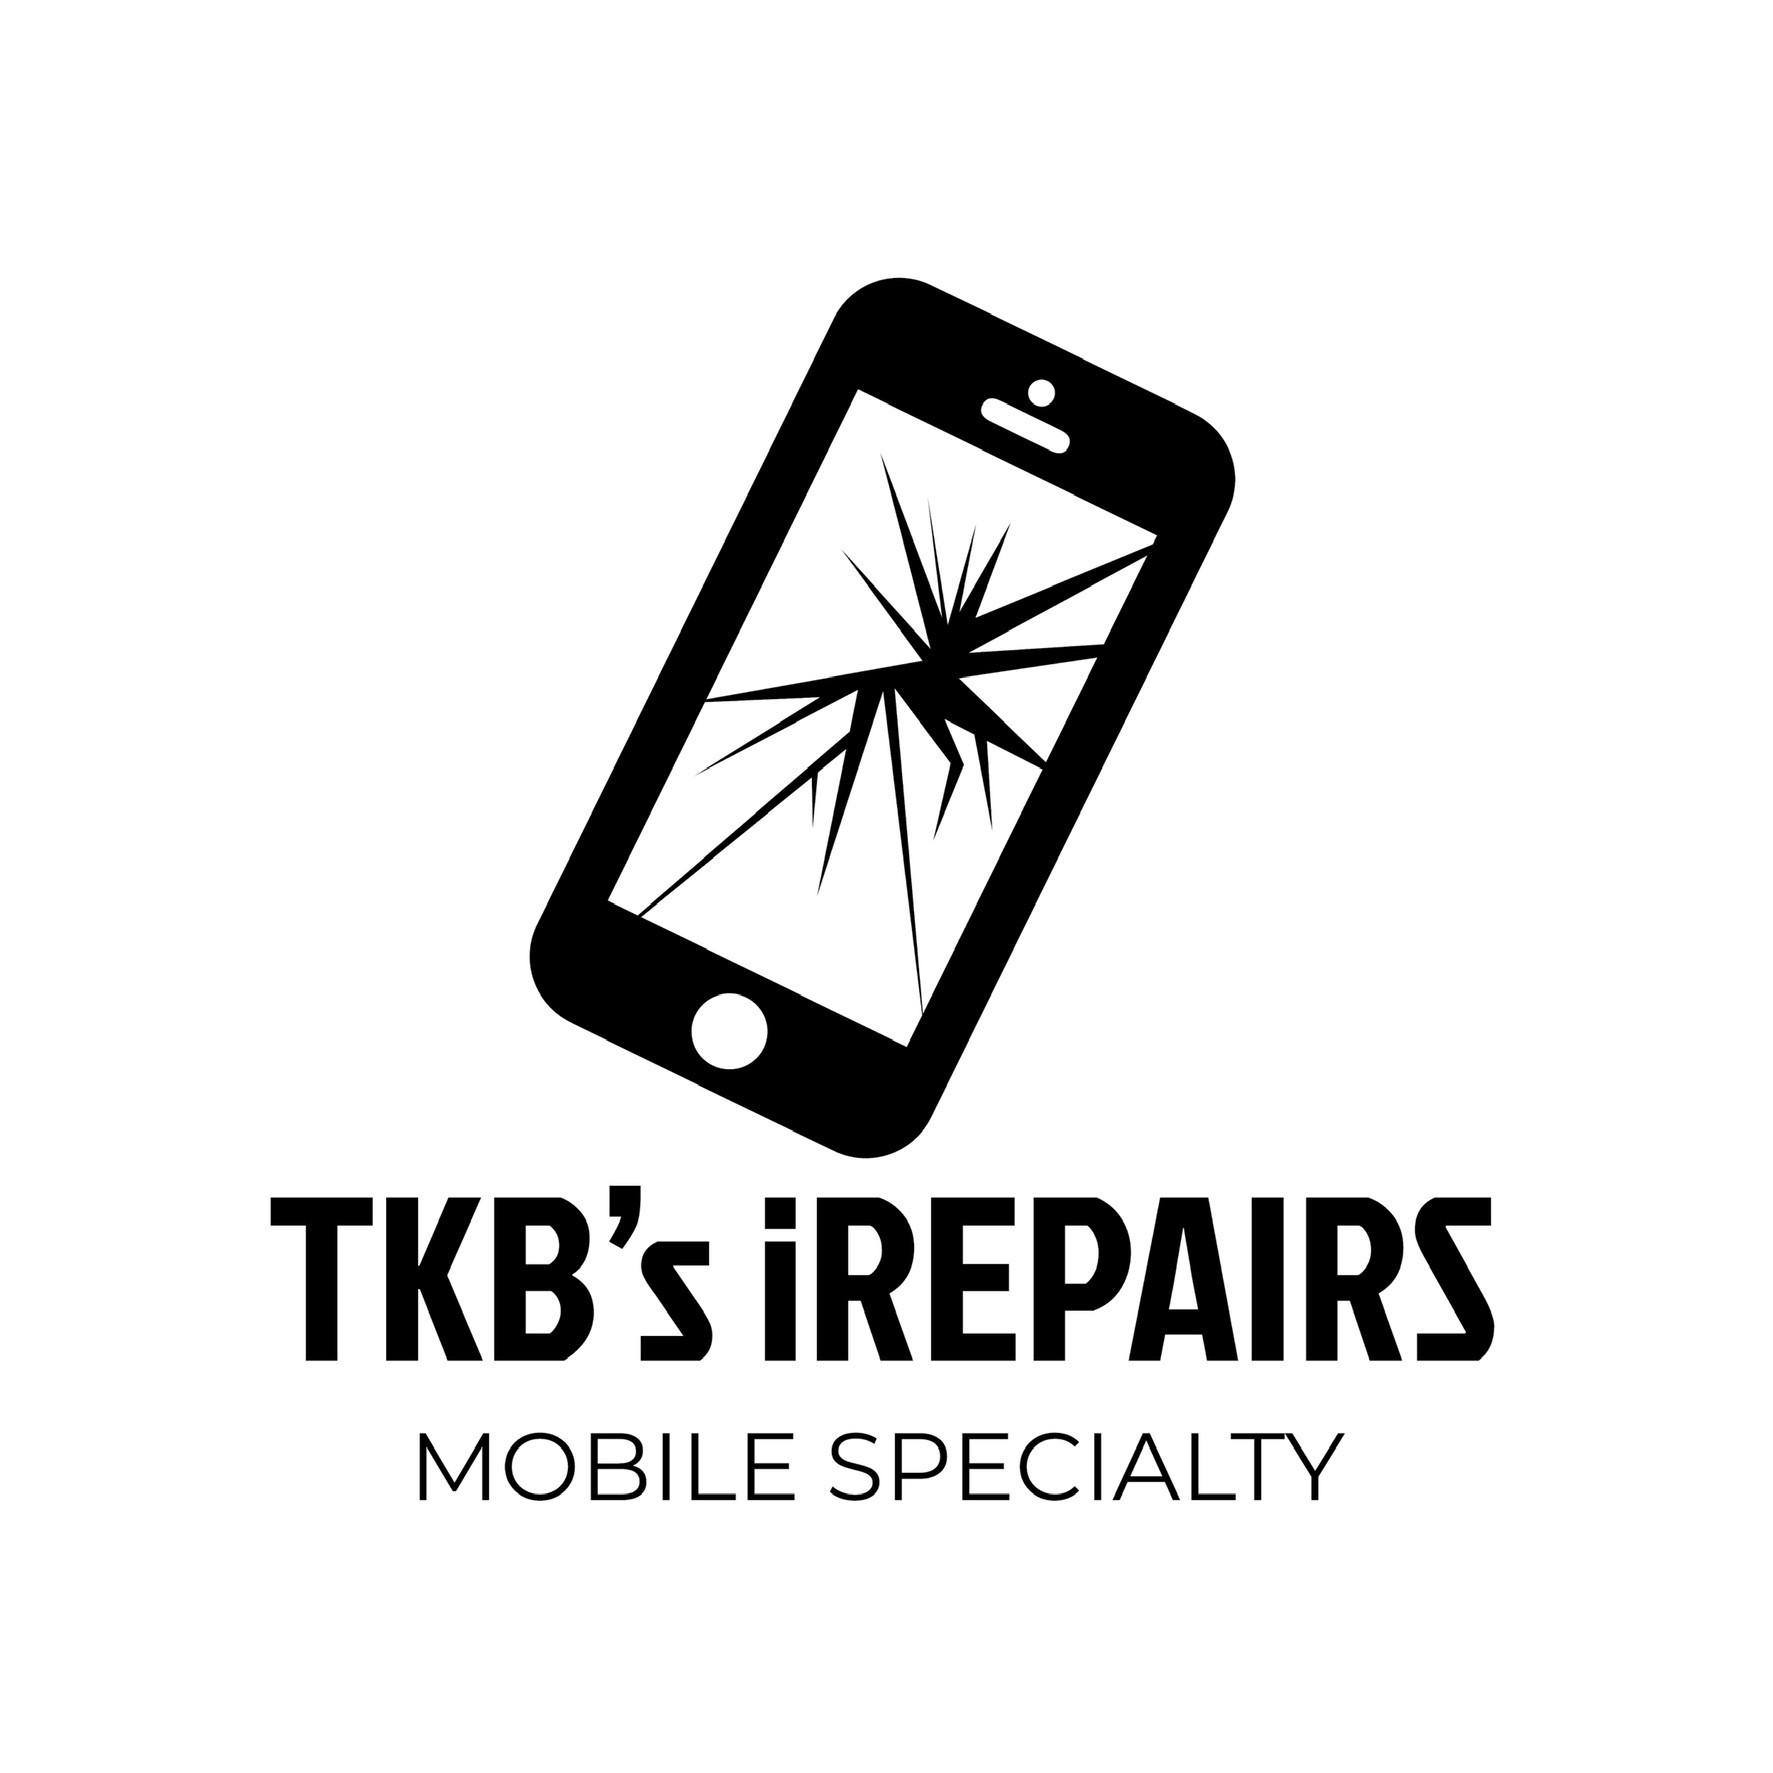 TKBs iRepairs